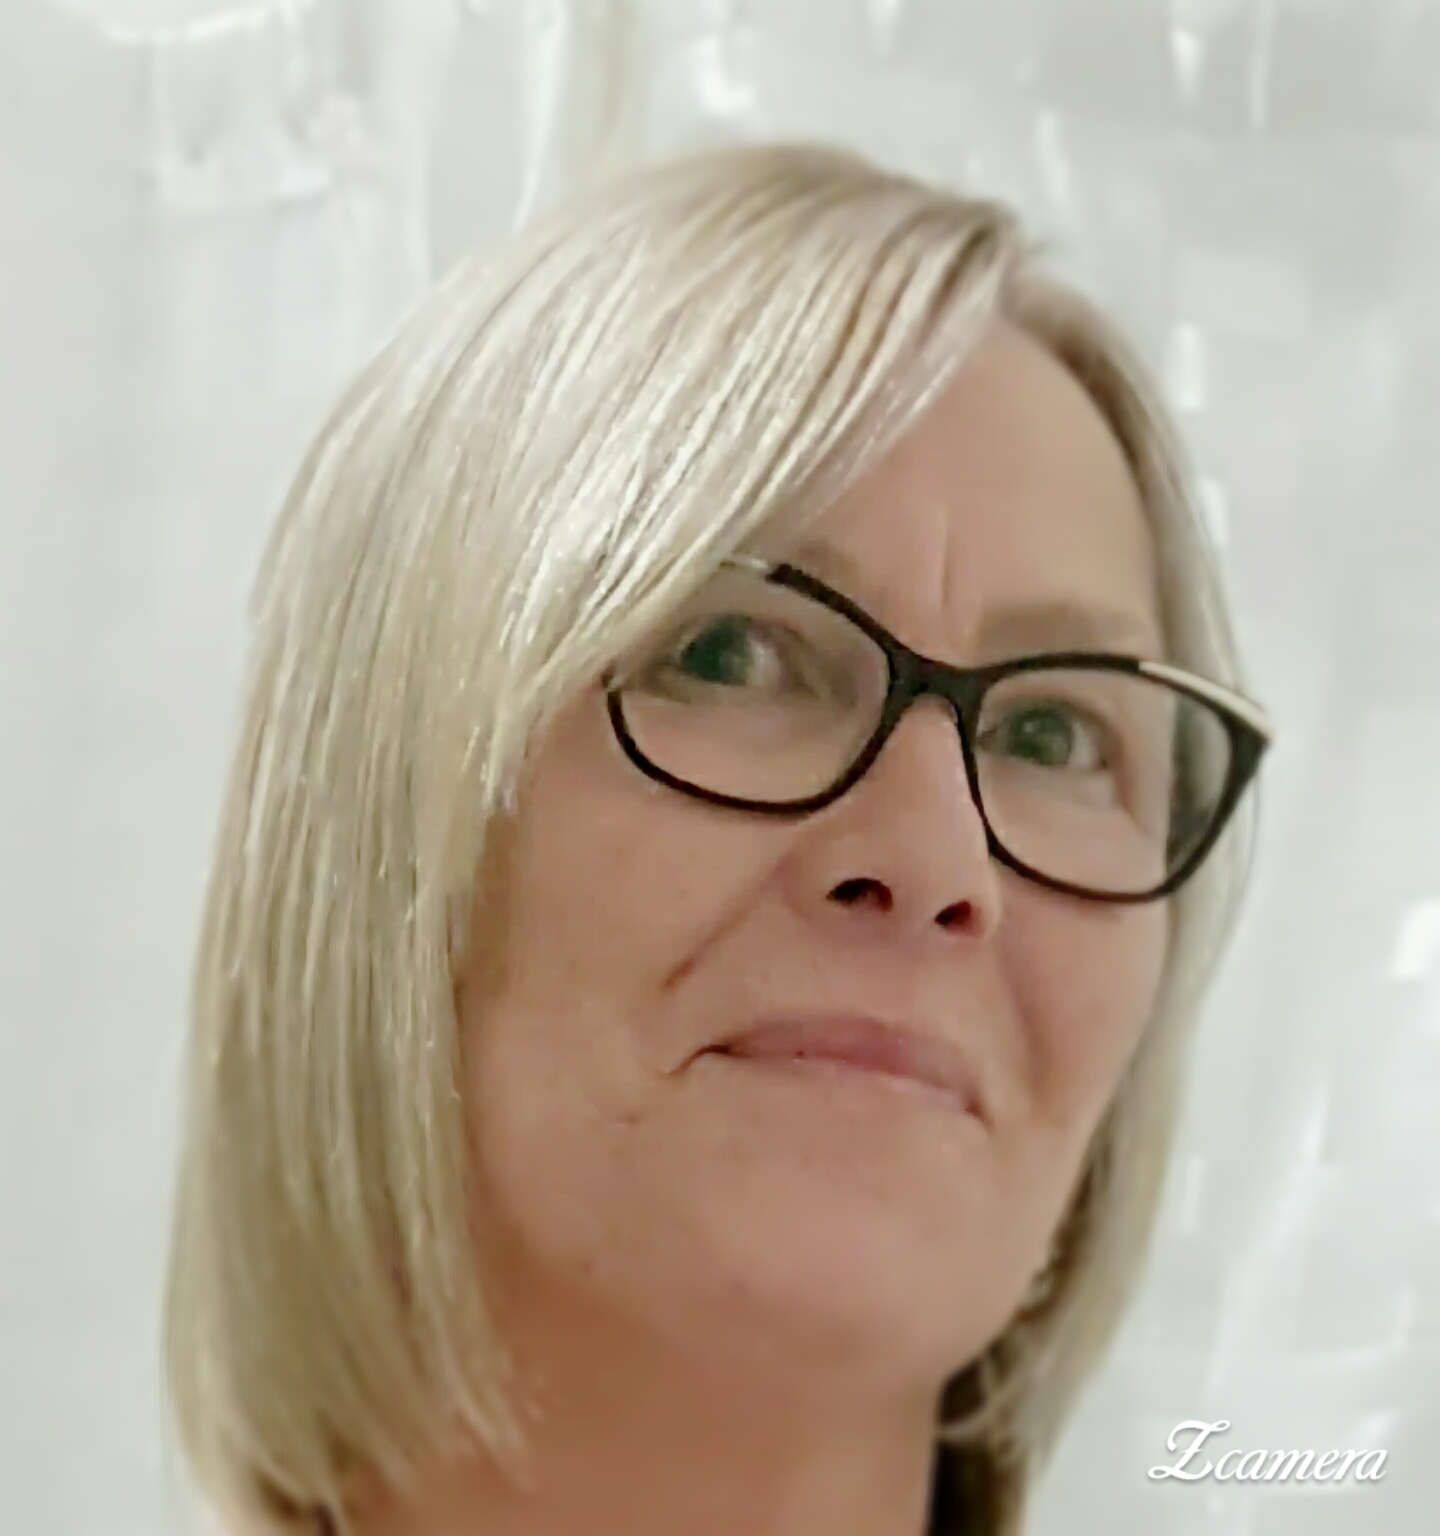 Deb Halloran